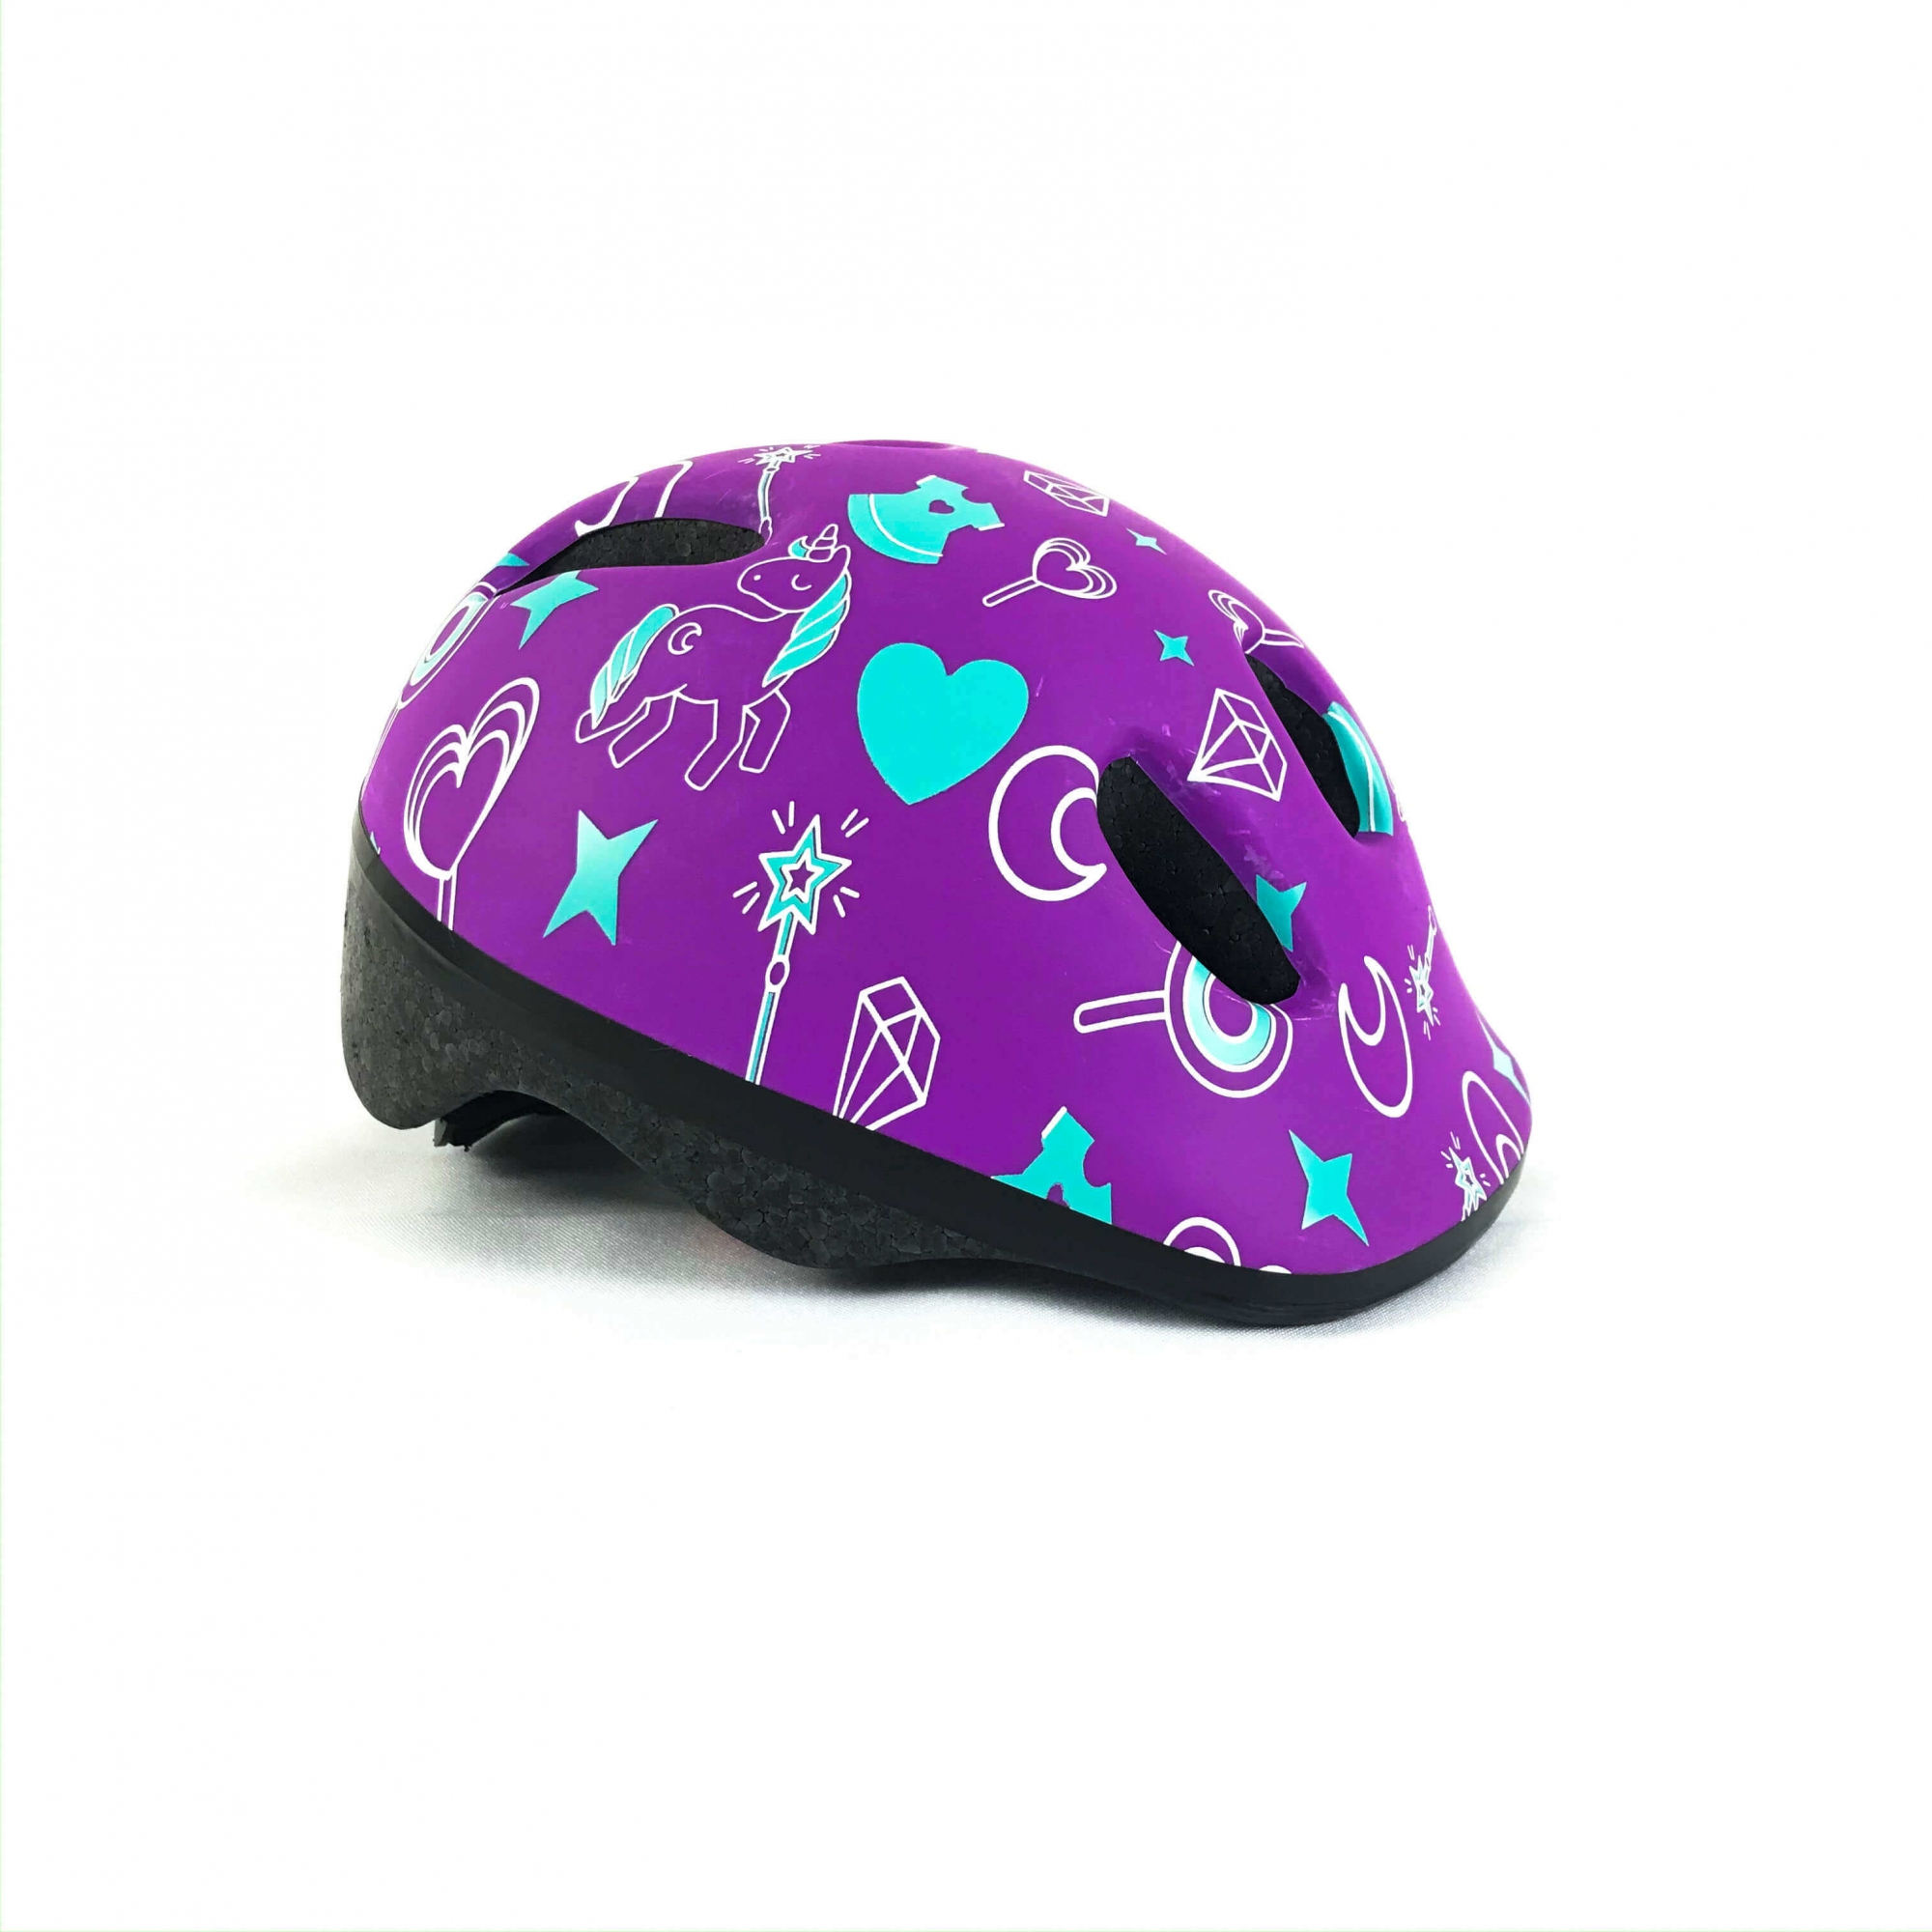 Capacete Infantil Para Bicicleta Triz Baby Roxo